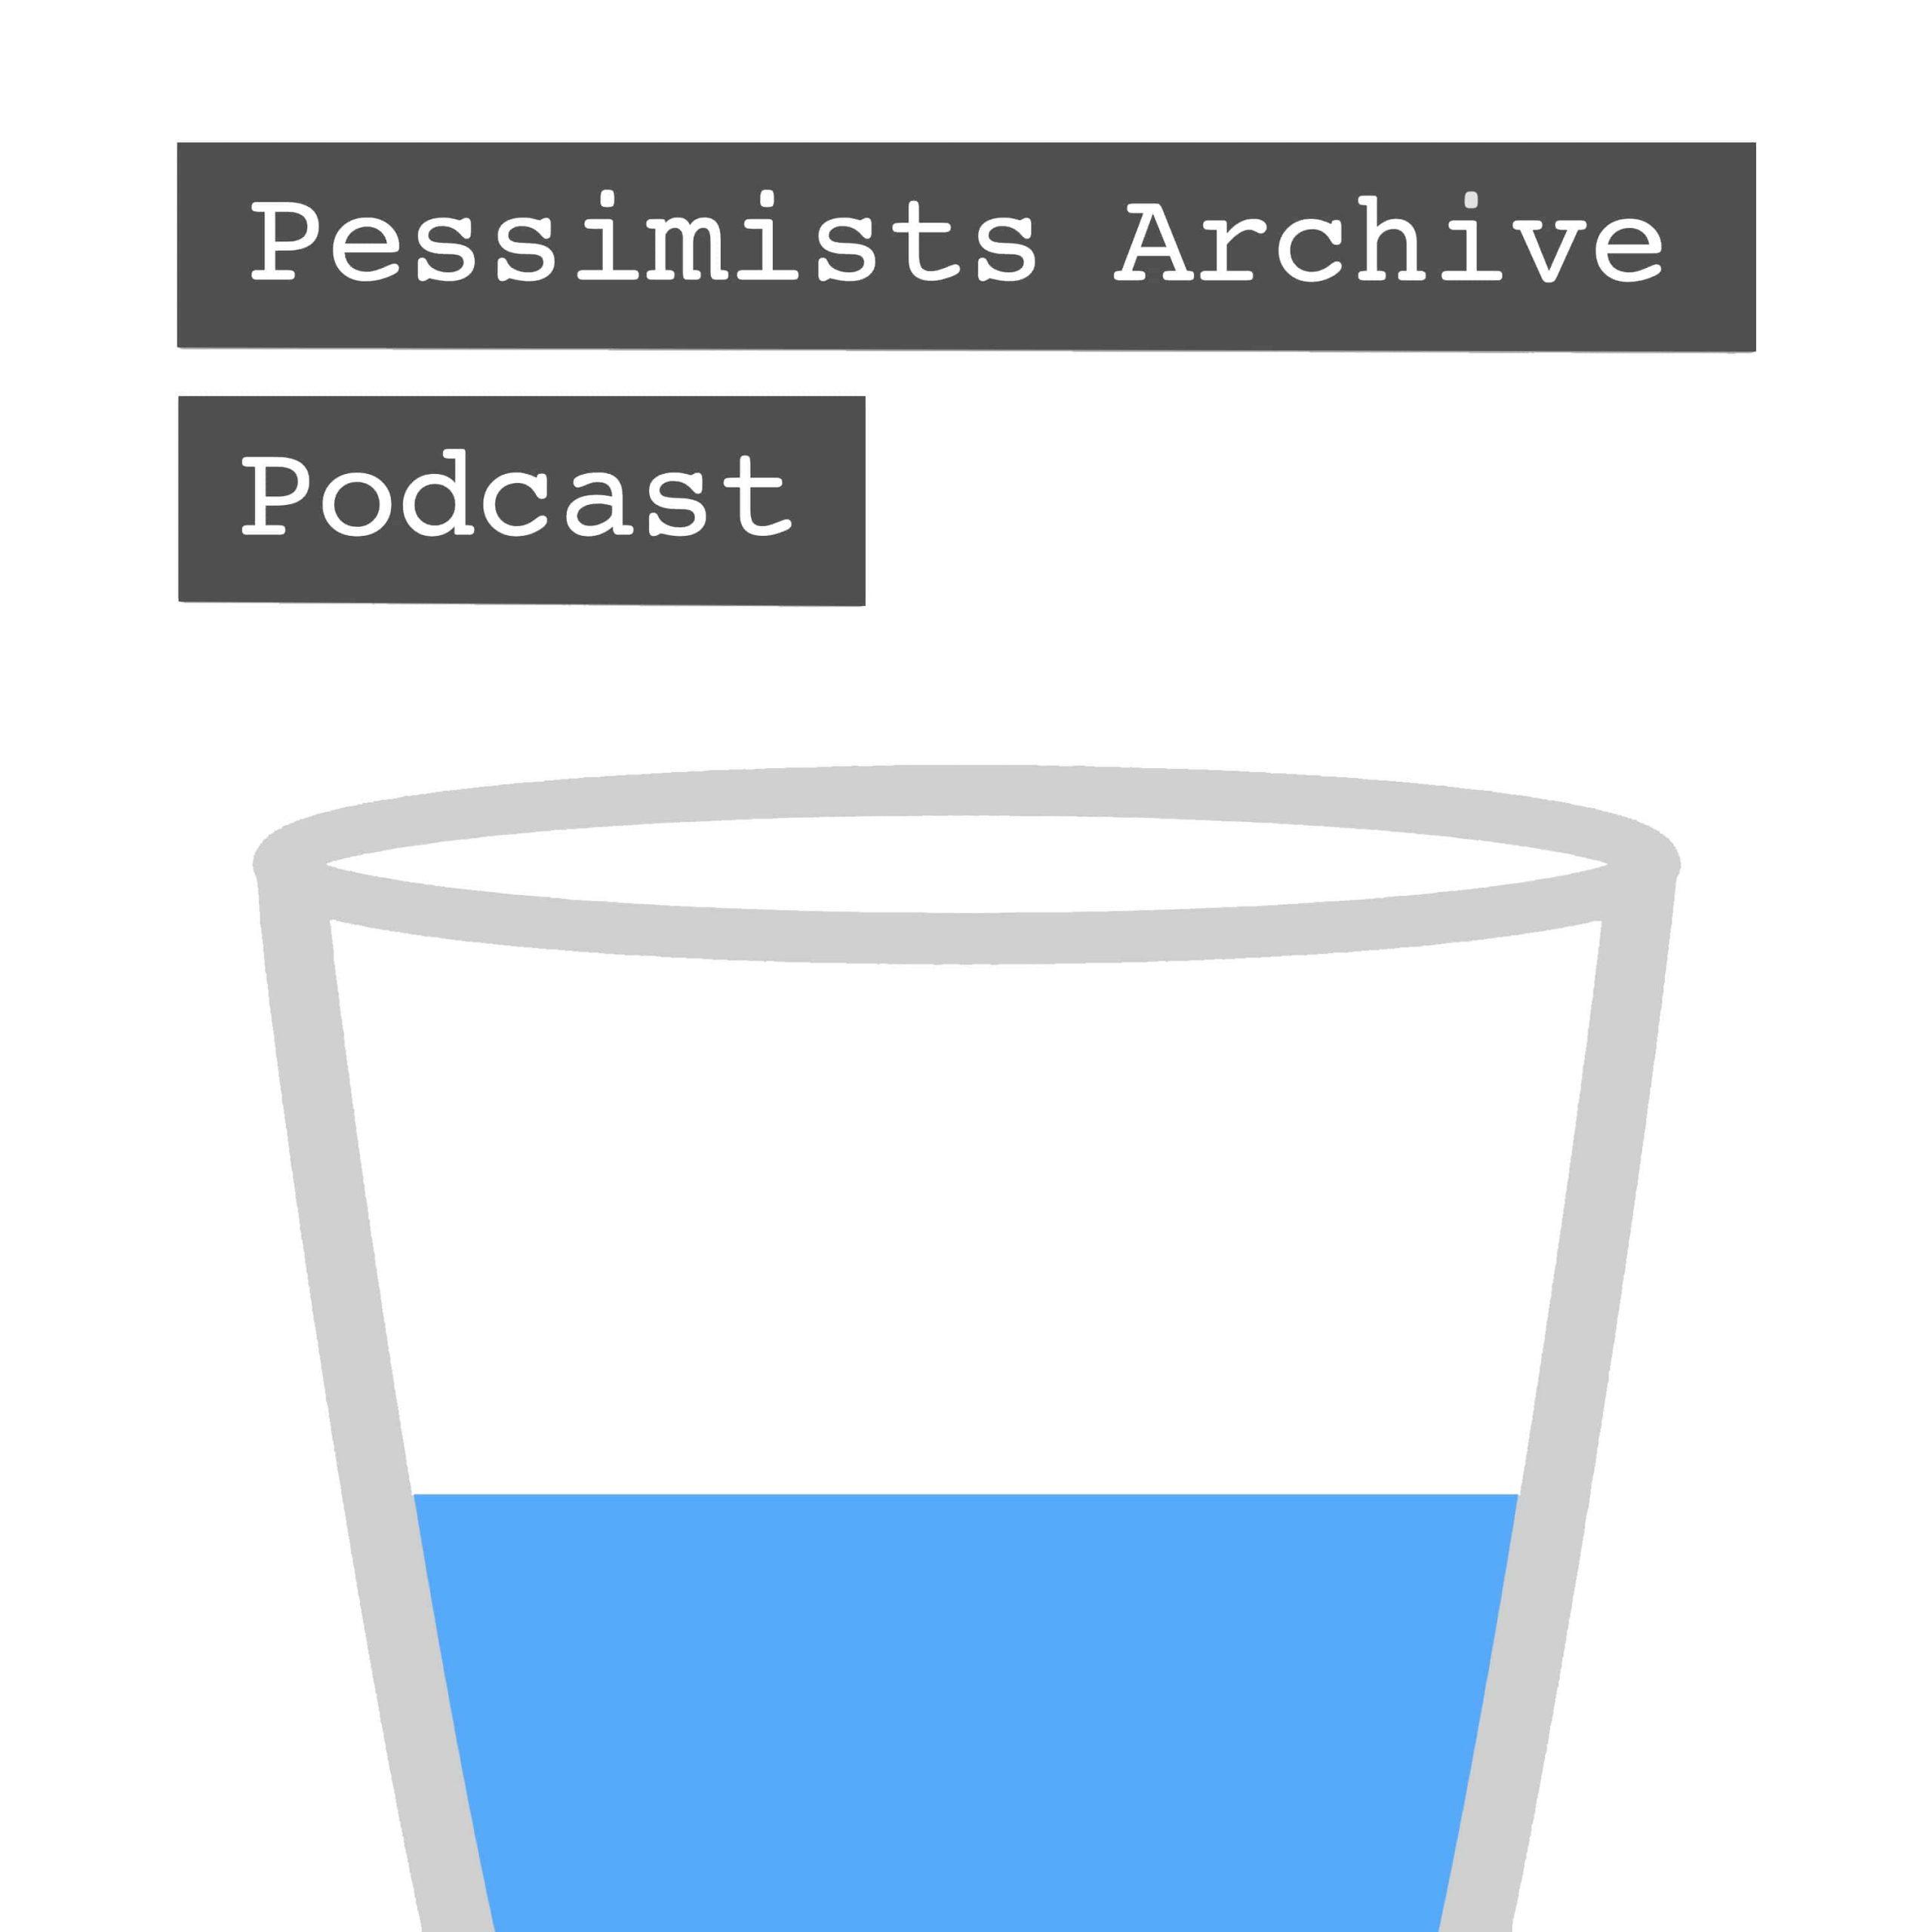 Podcast – Pessimists Archive